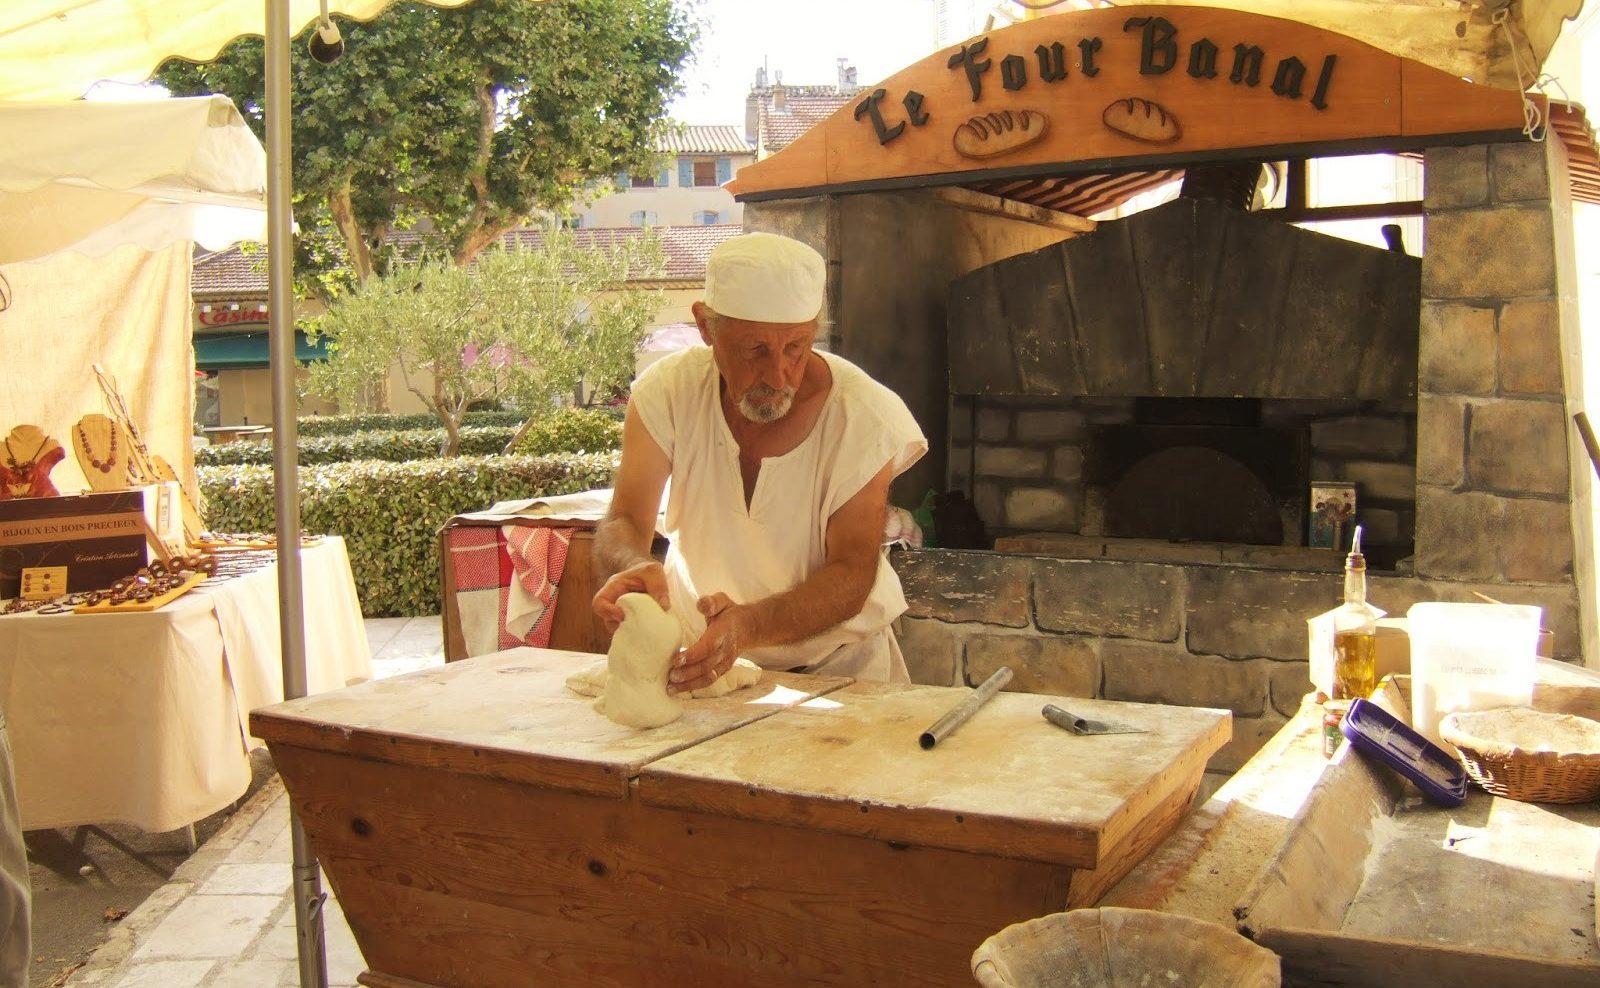 MyFrenchLife™ - MyFrenchLife.org - Jan Leishman - Var medieval festival - bakery